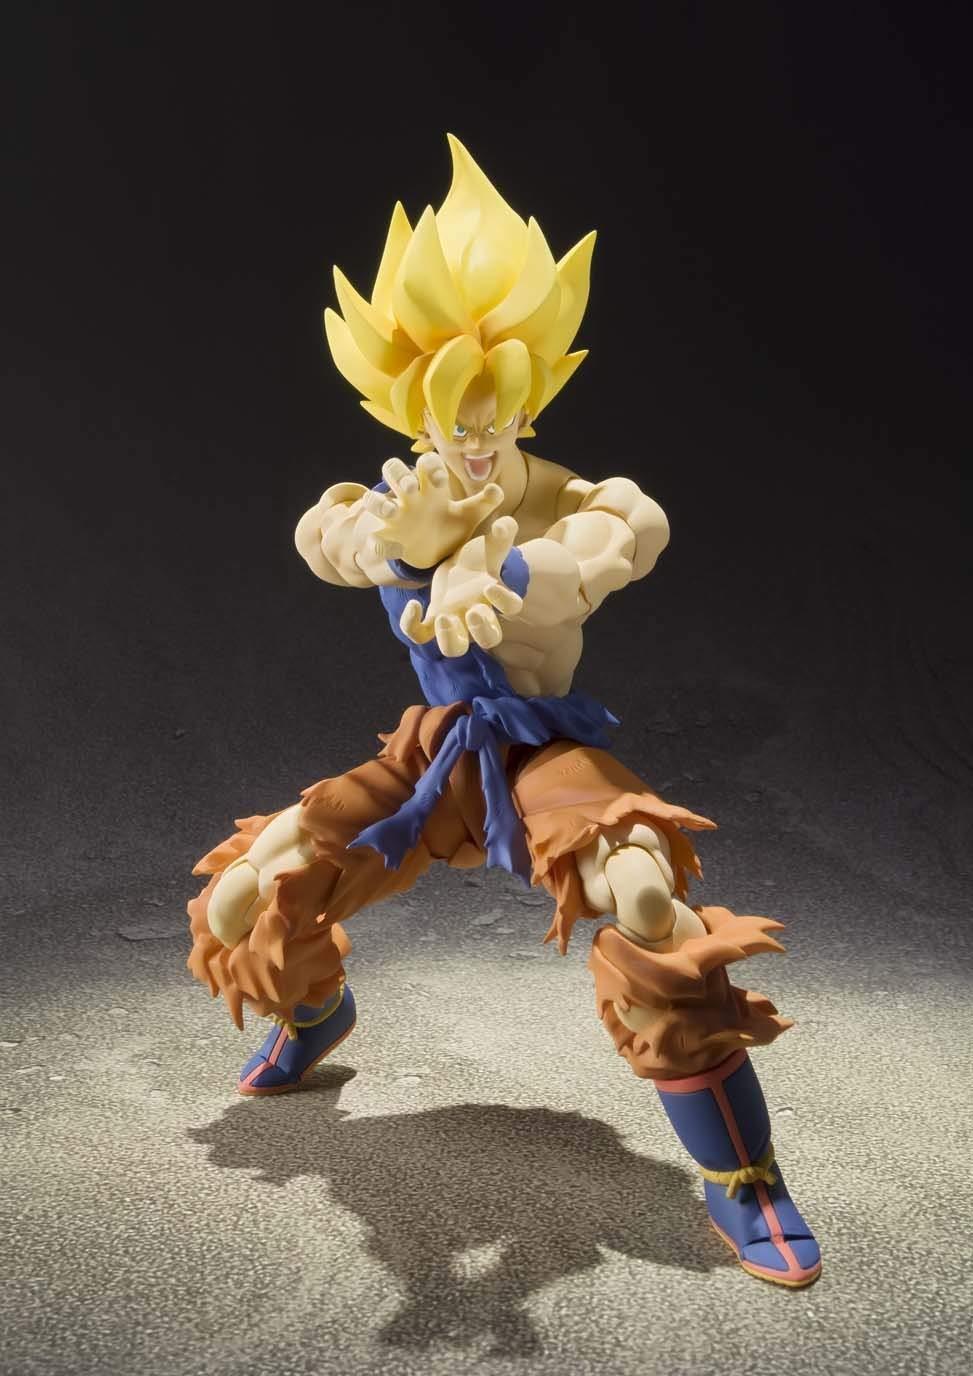 S.H.Figuarts Dragon Ball Z Super Saiyan Goku 160mm Figure